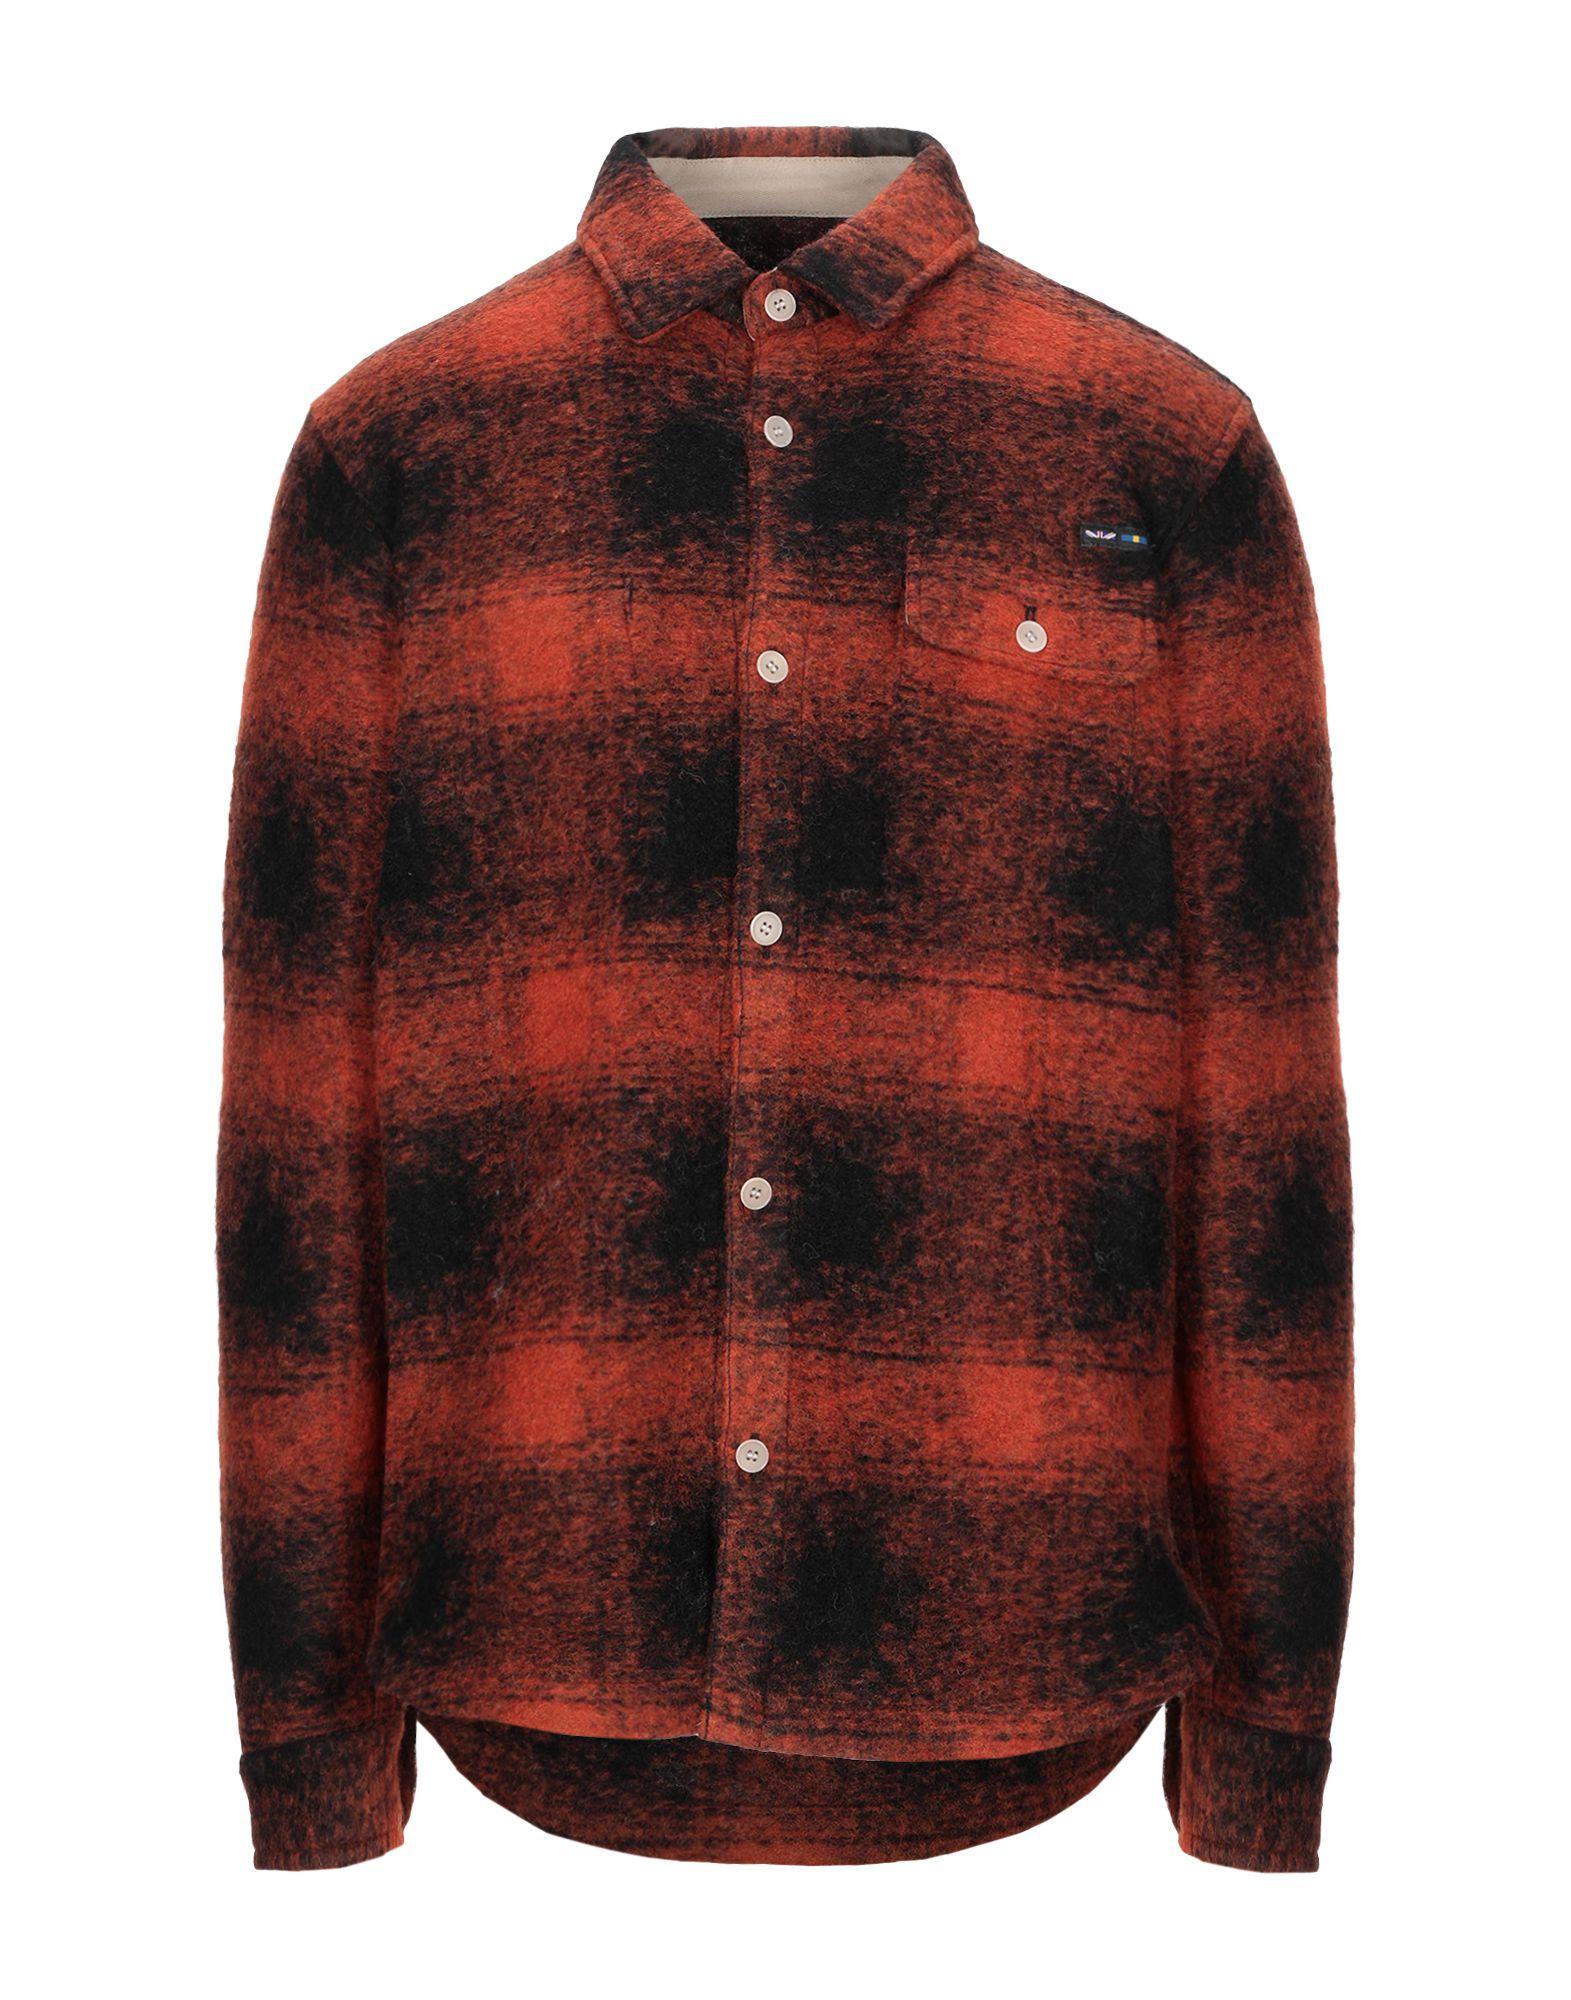 цена на NIGEL CABOURN x PEAK PERFORMANCE Pубашка